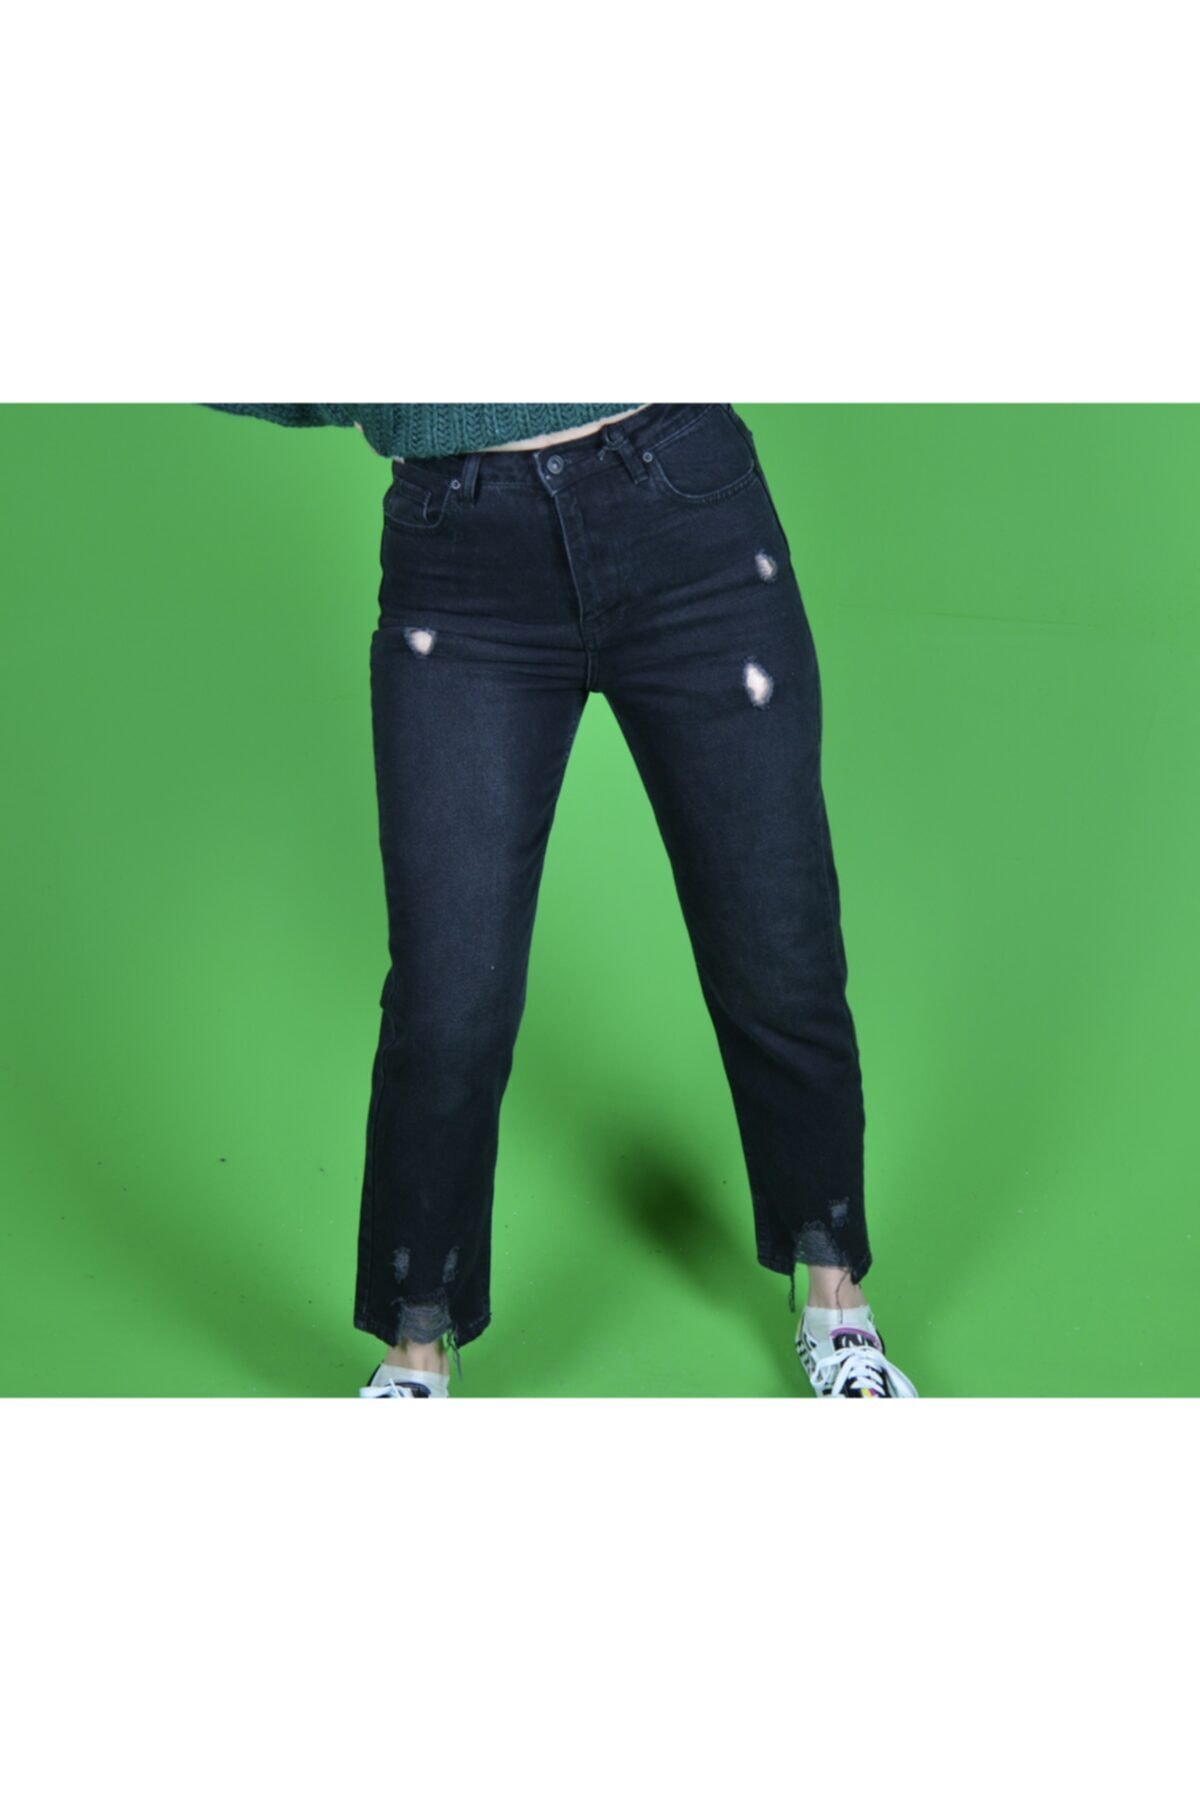 خرید اینترنتی شلوار جین خاص زنانه SWEG رنگ مشکی کد ty94119552